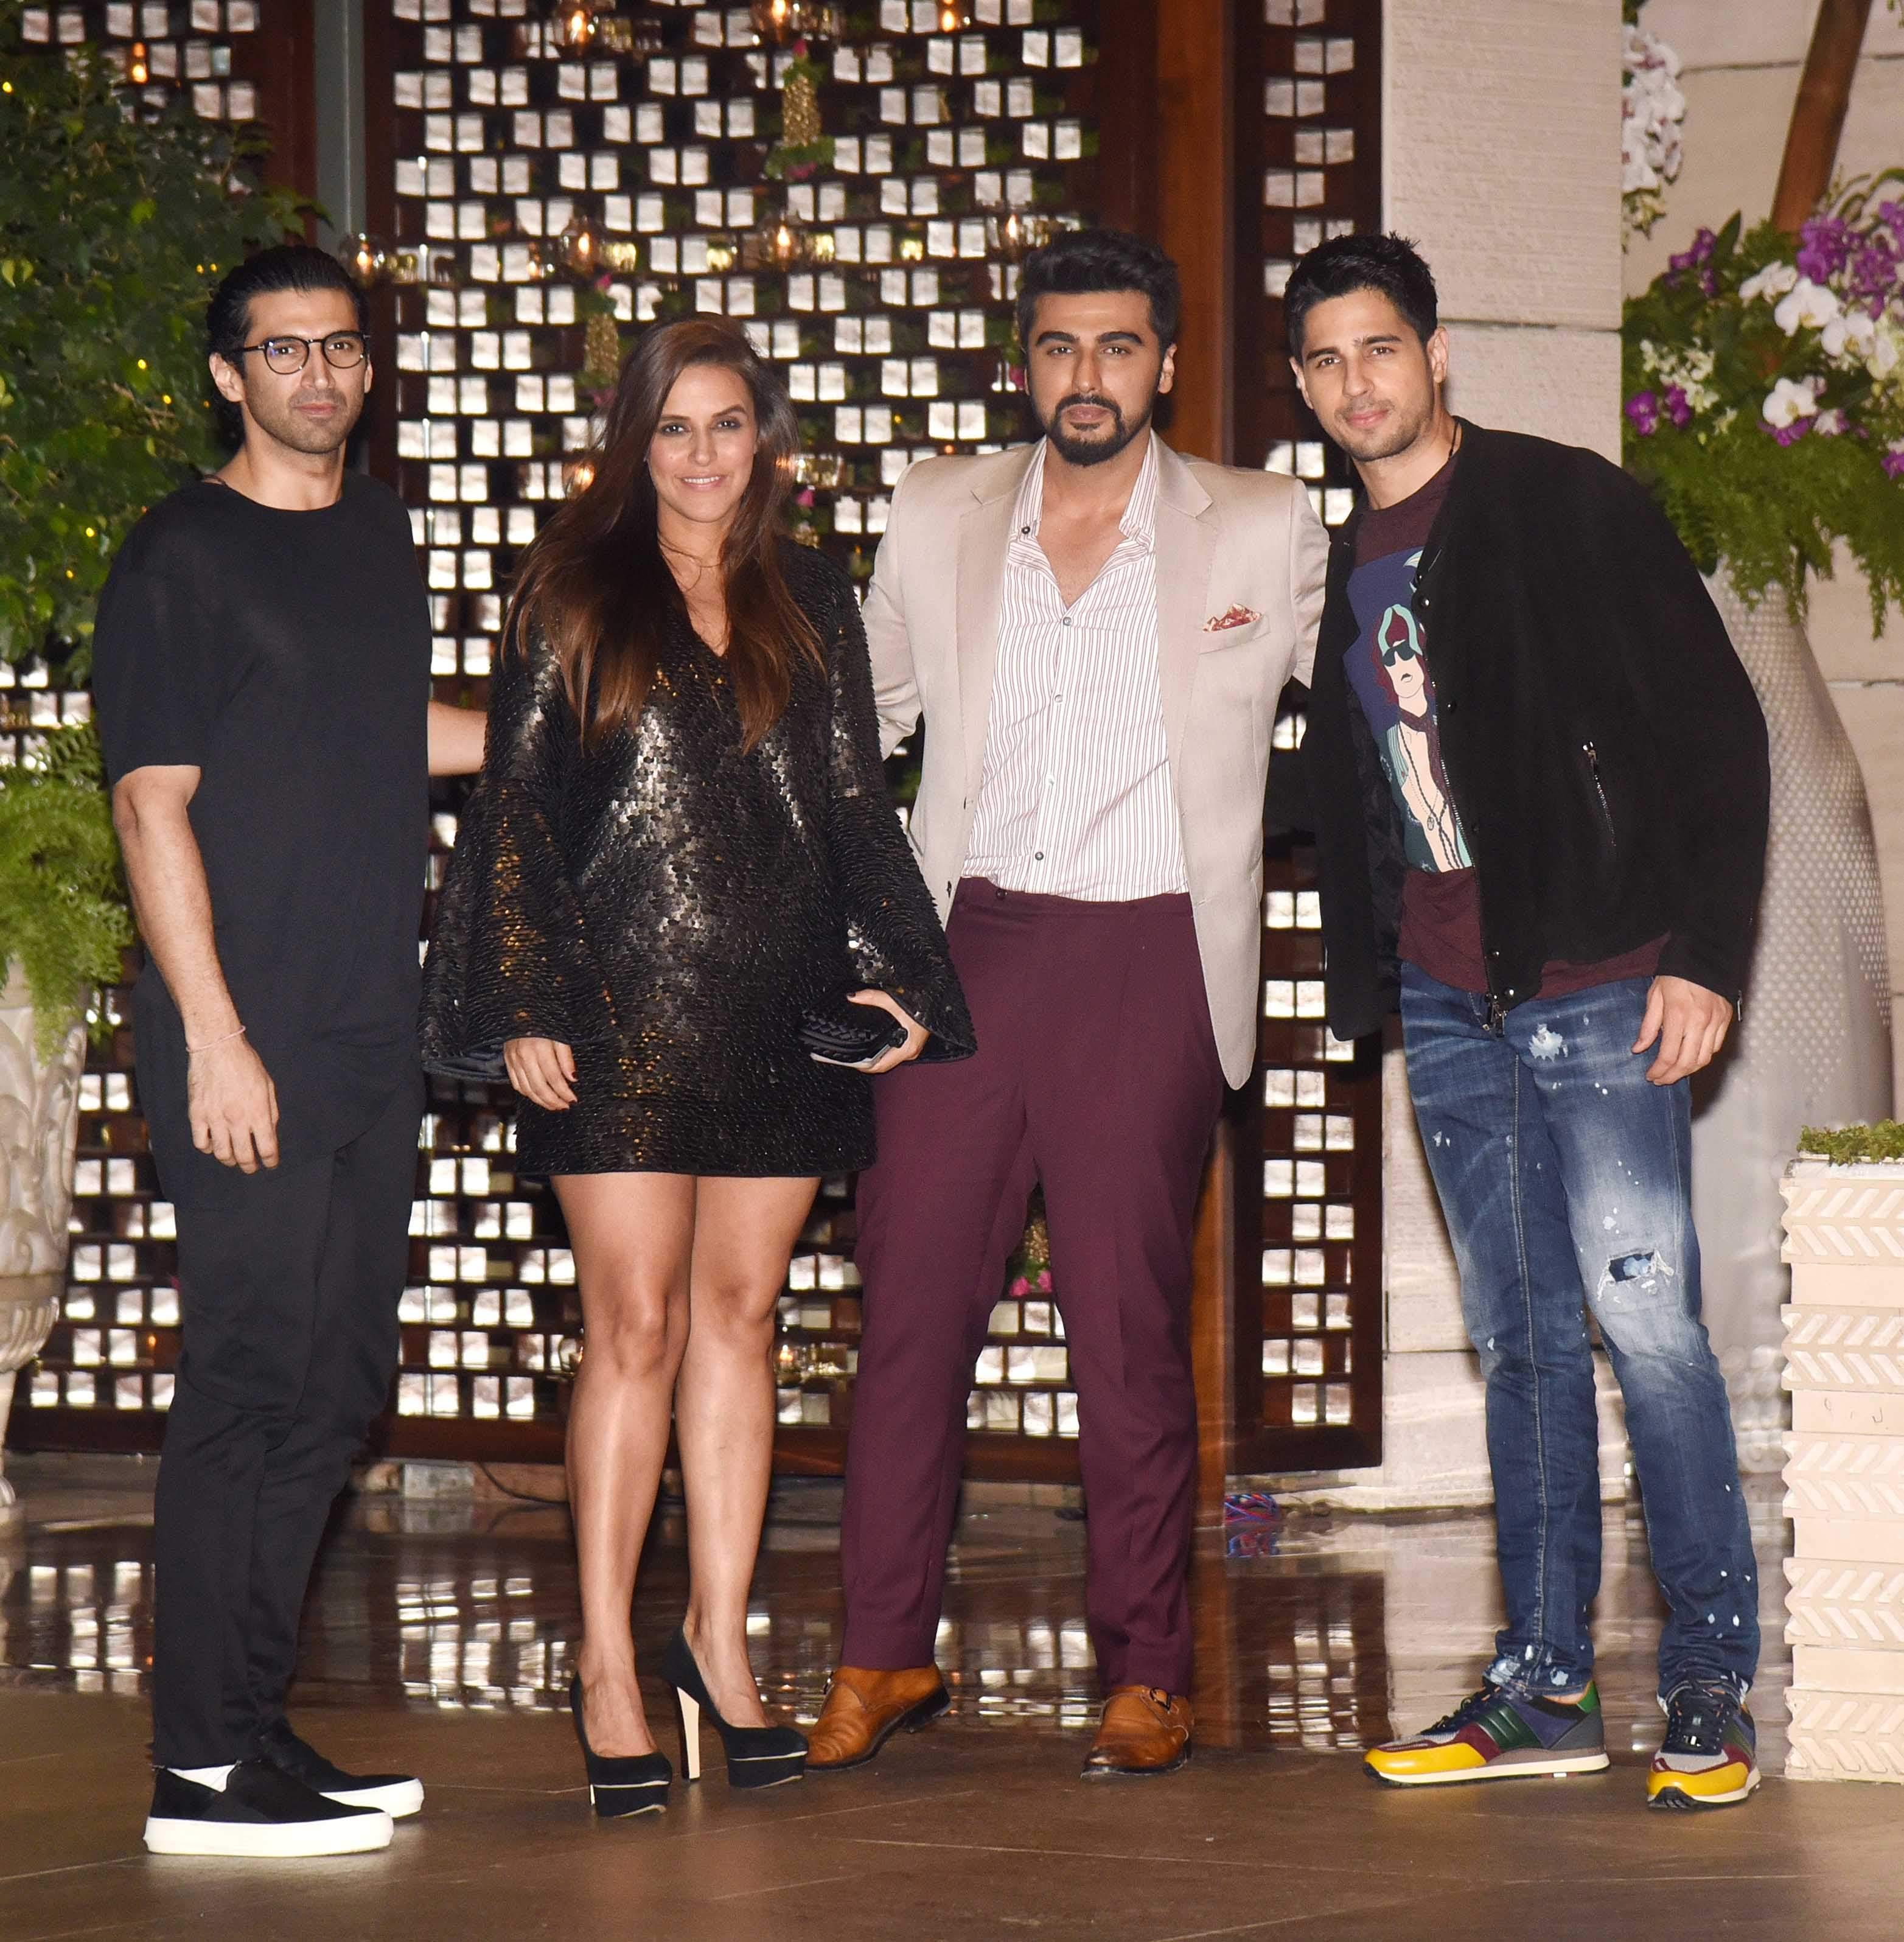 Aditya Roy Kapur, Neha Dhupia, Arjun Kapoor, Sidharth Kapoor